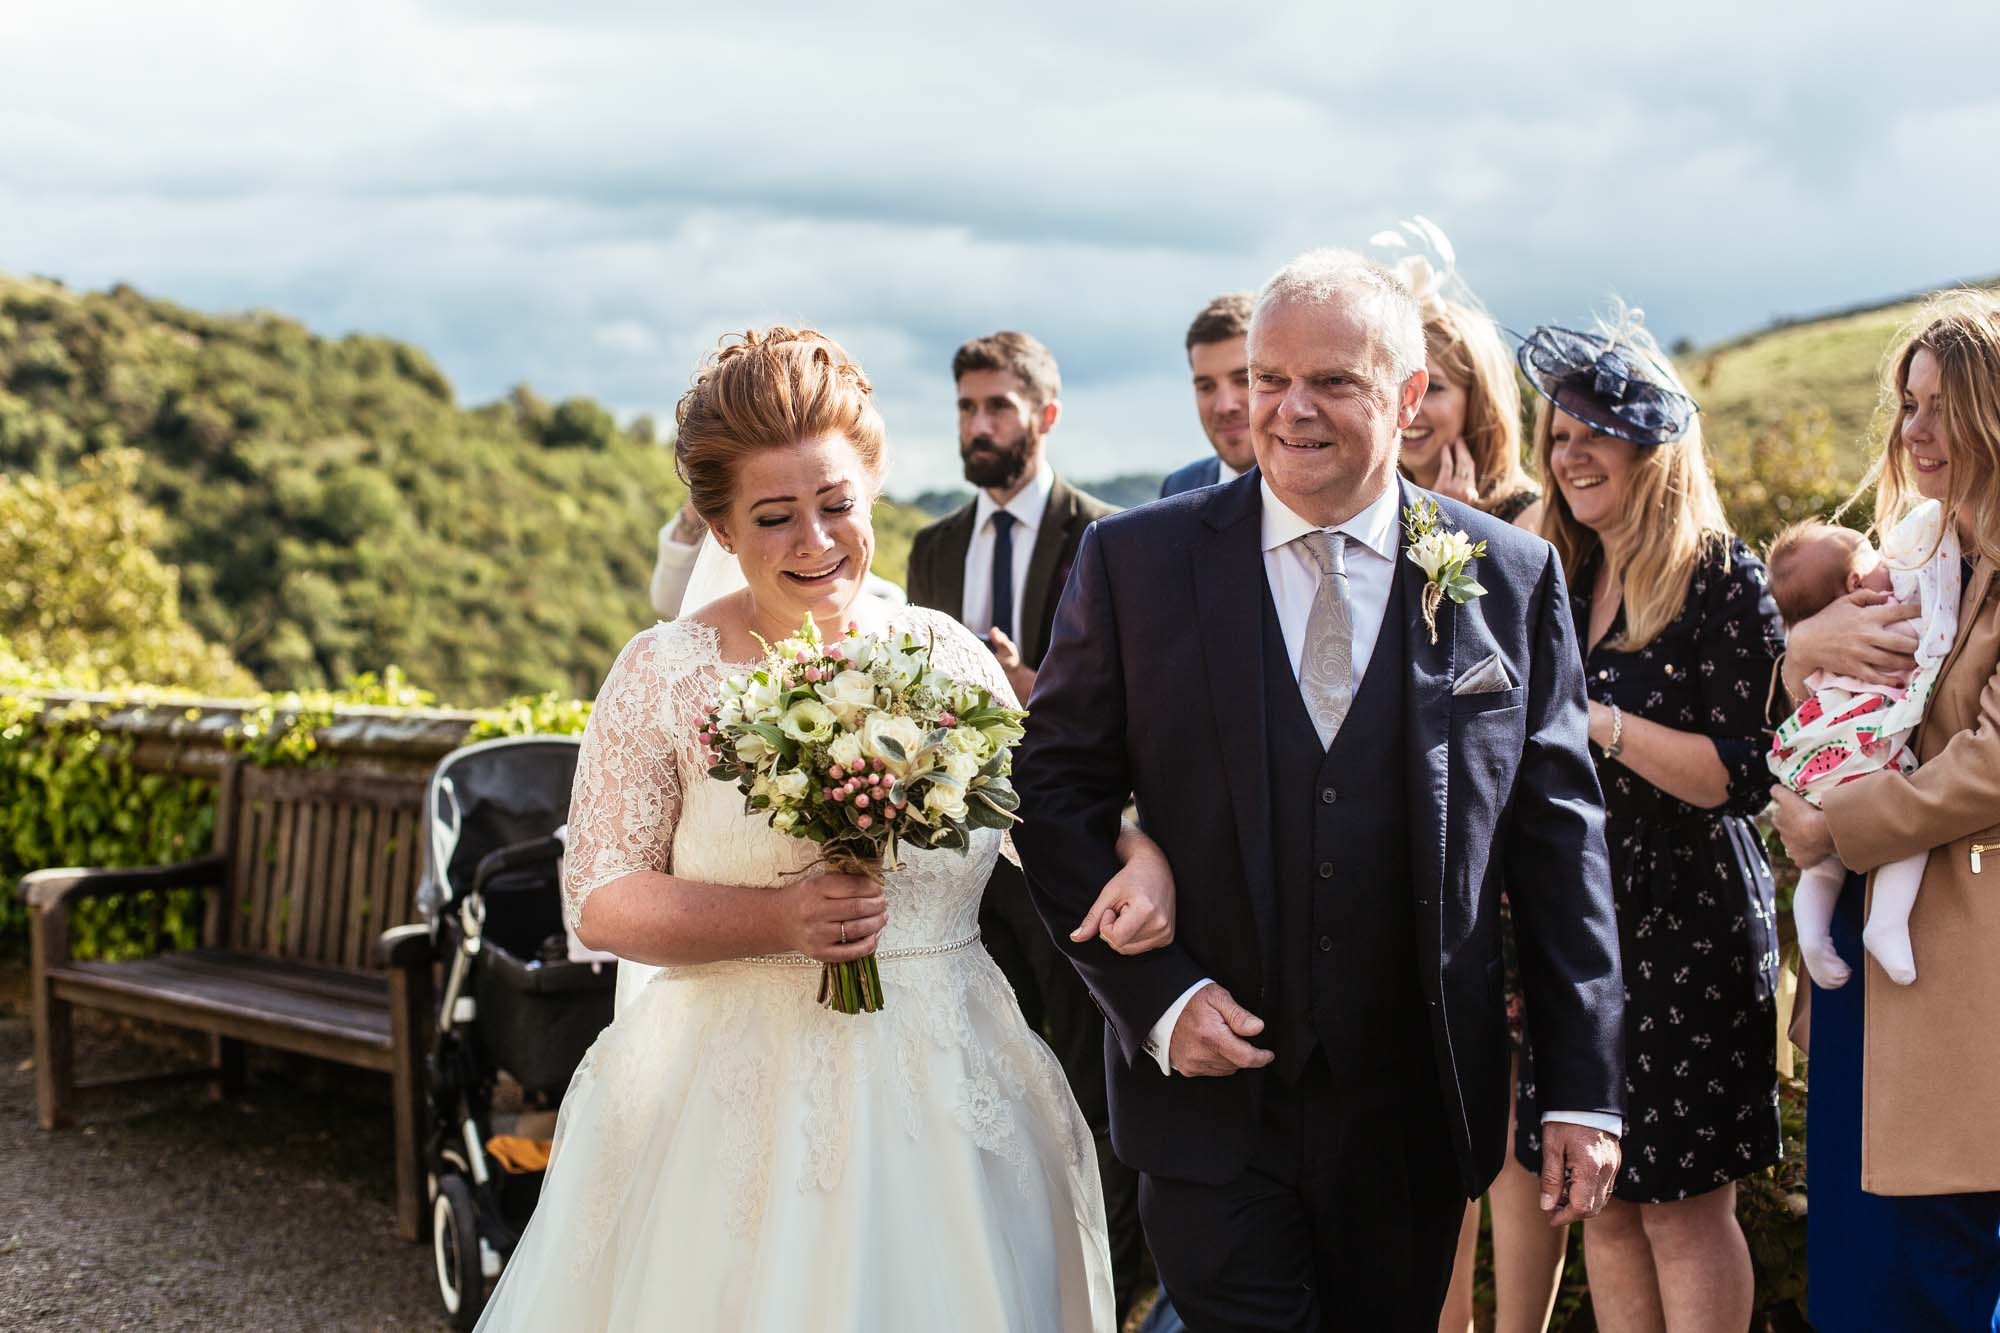 Cressbrook Hall Wedding Ceremony